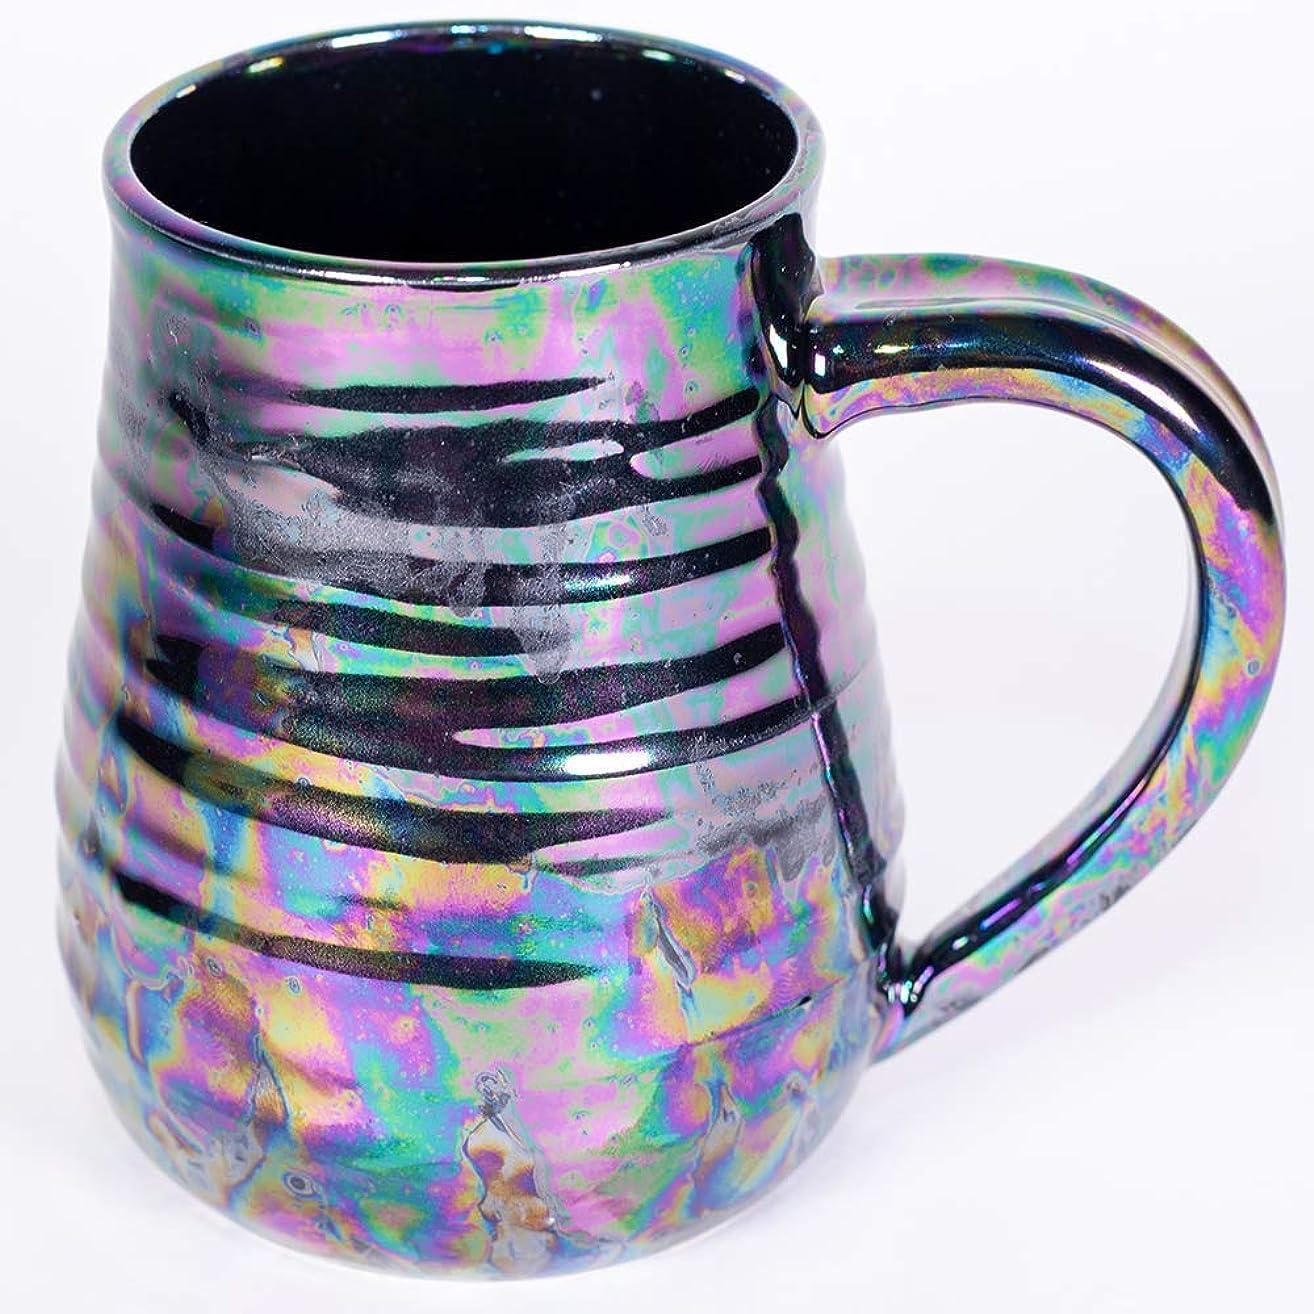 Black Pearl Handmade Pottery Mug